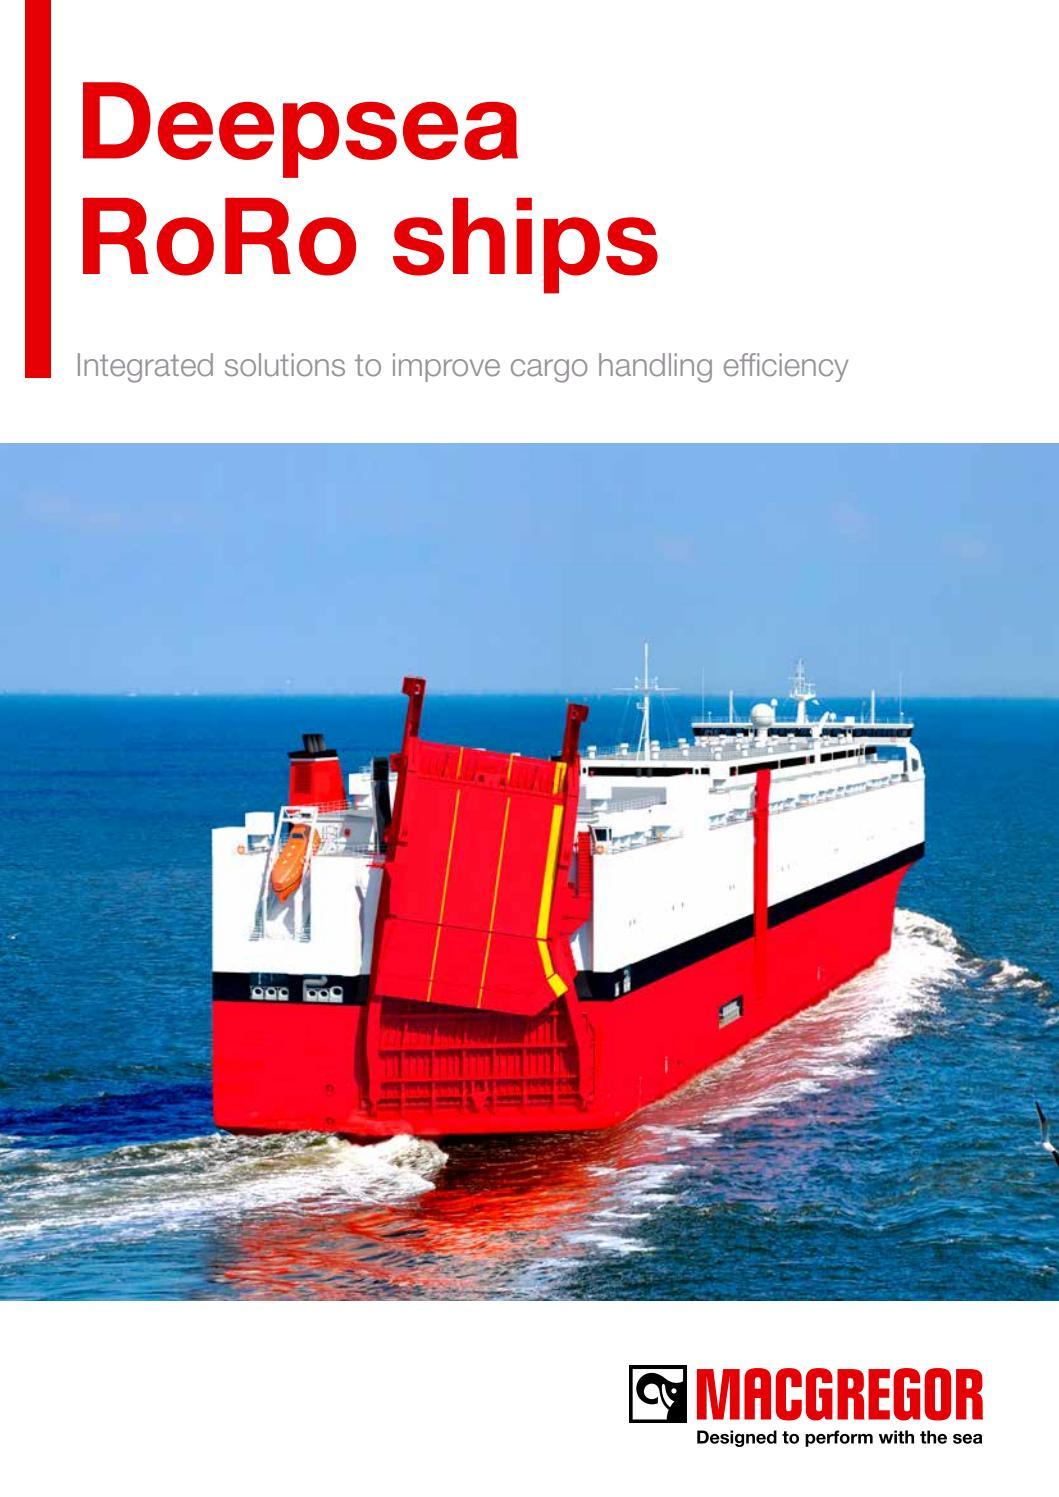 Deepsea RoRo ships brochure 2017 by Cargotec - issuu